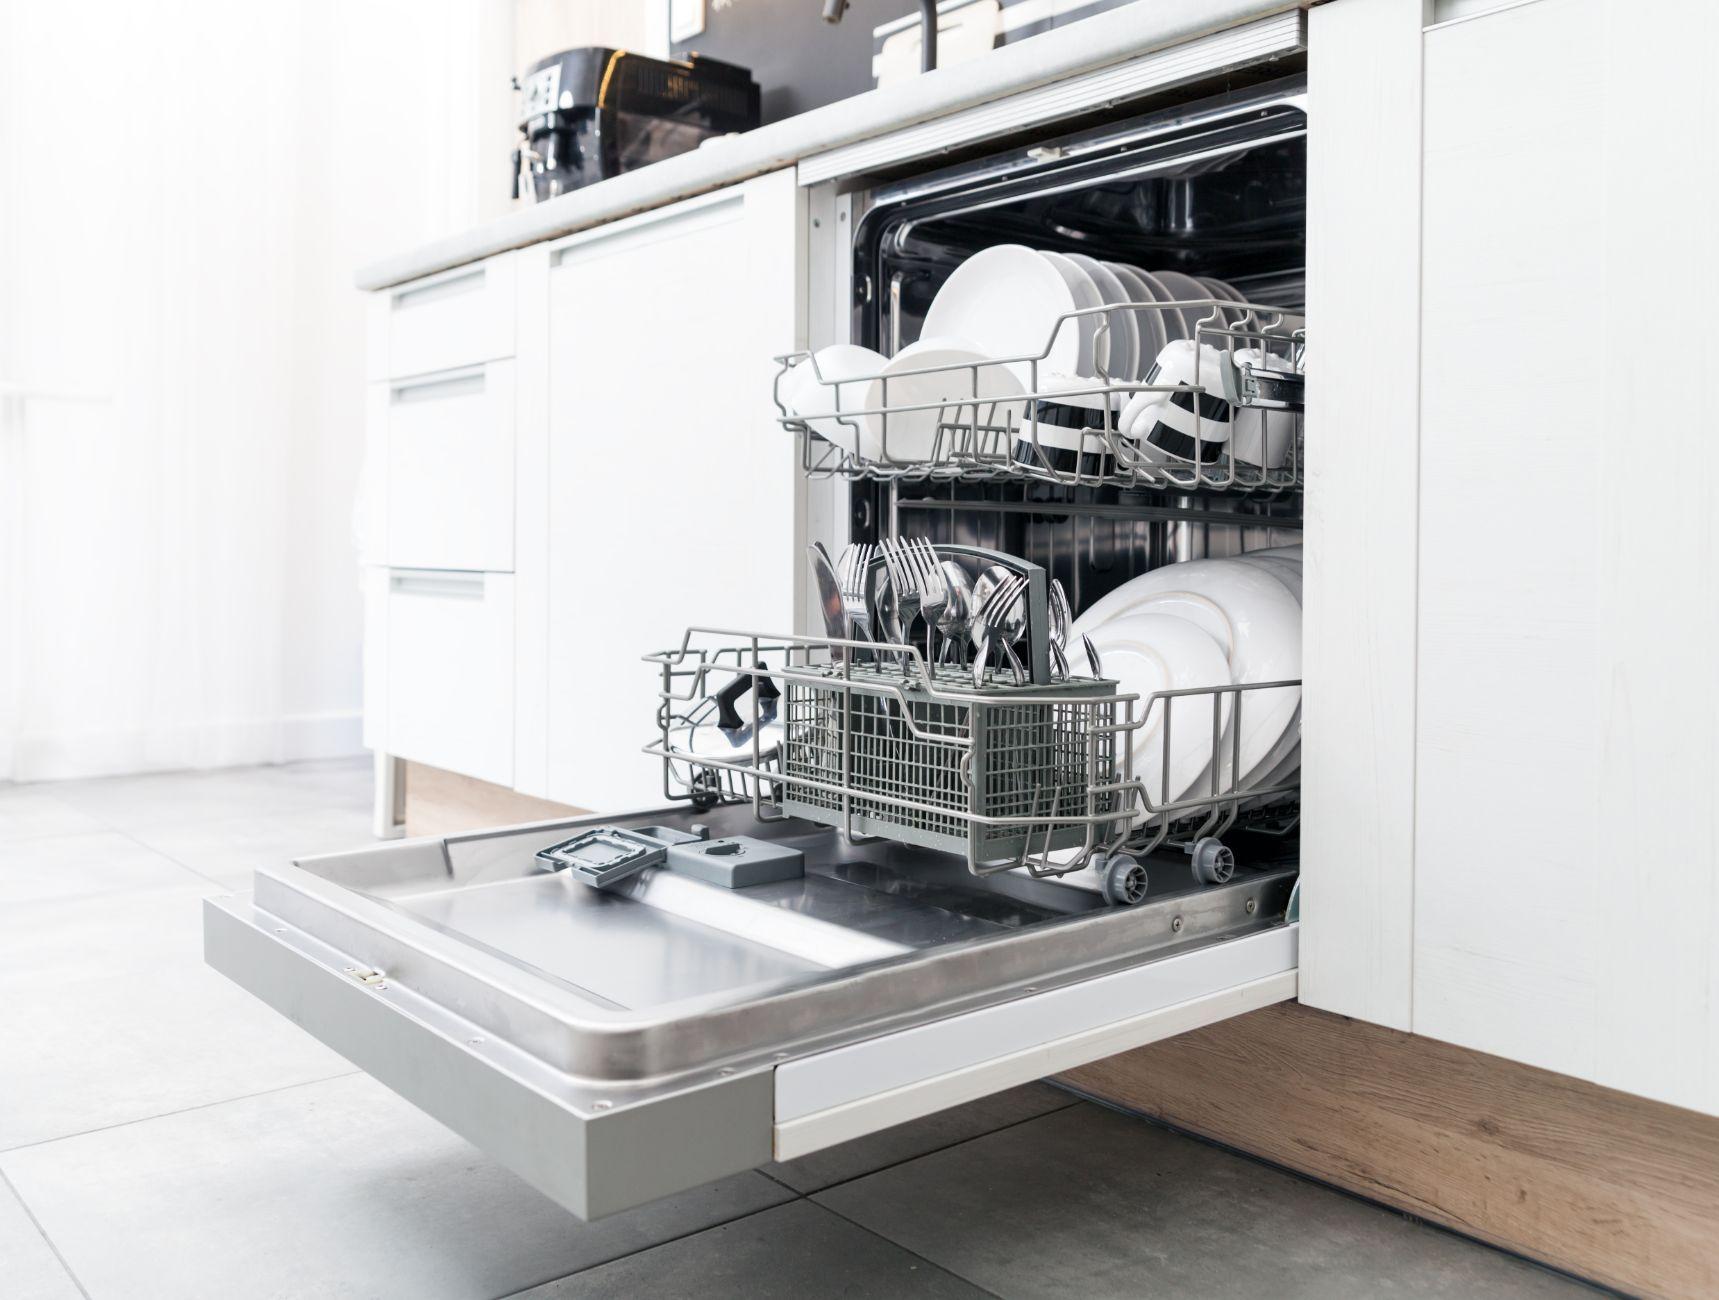 Foto 16 de Electrodomésticos (reparación) en  | Servicio Técnico Oficial Samsung LG Candy Otsein